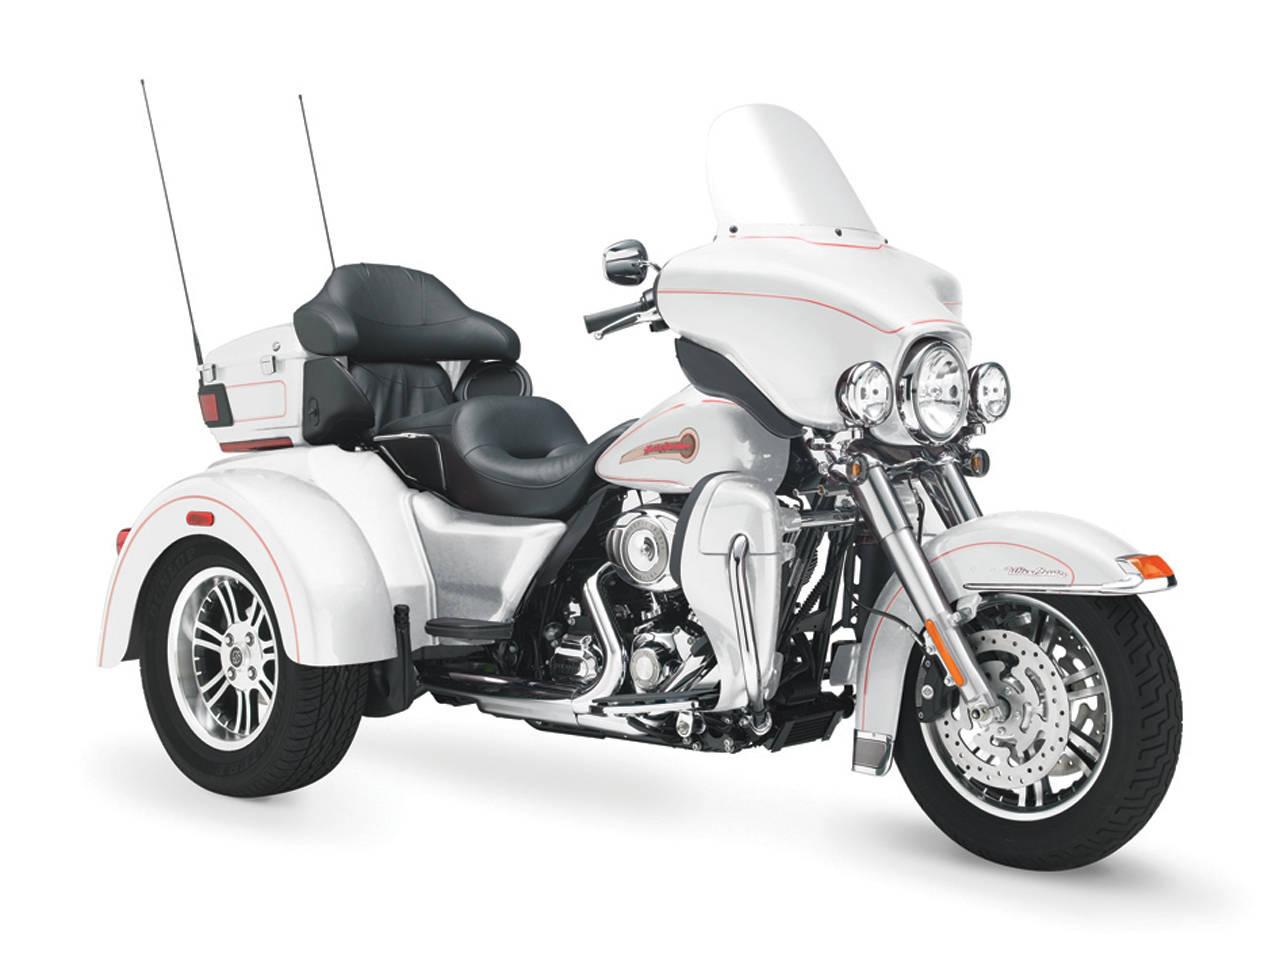 White Harley Davidson: Harley Davidson Logo Black And White